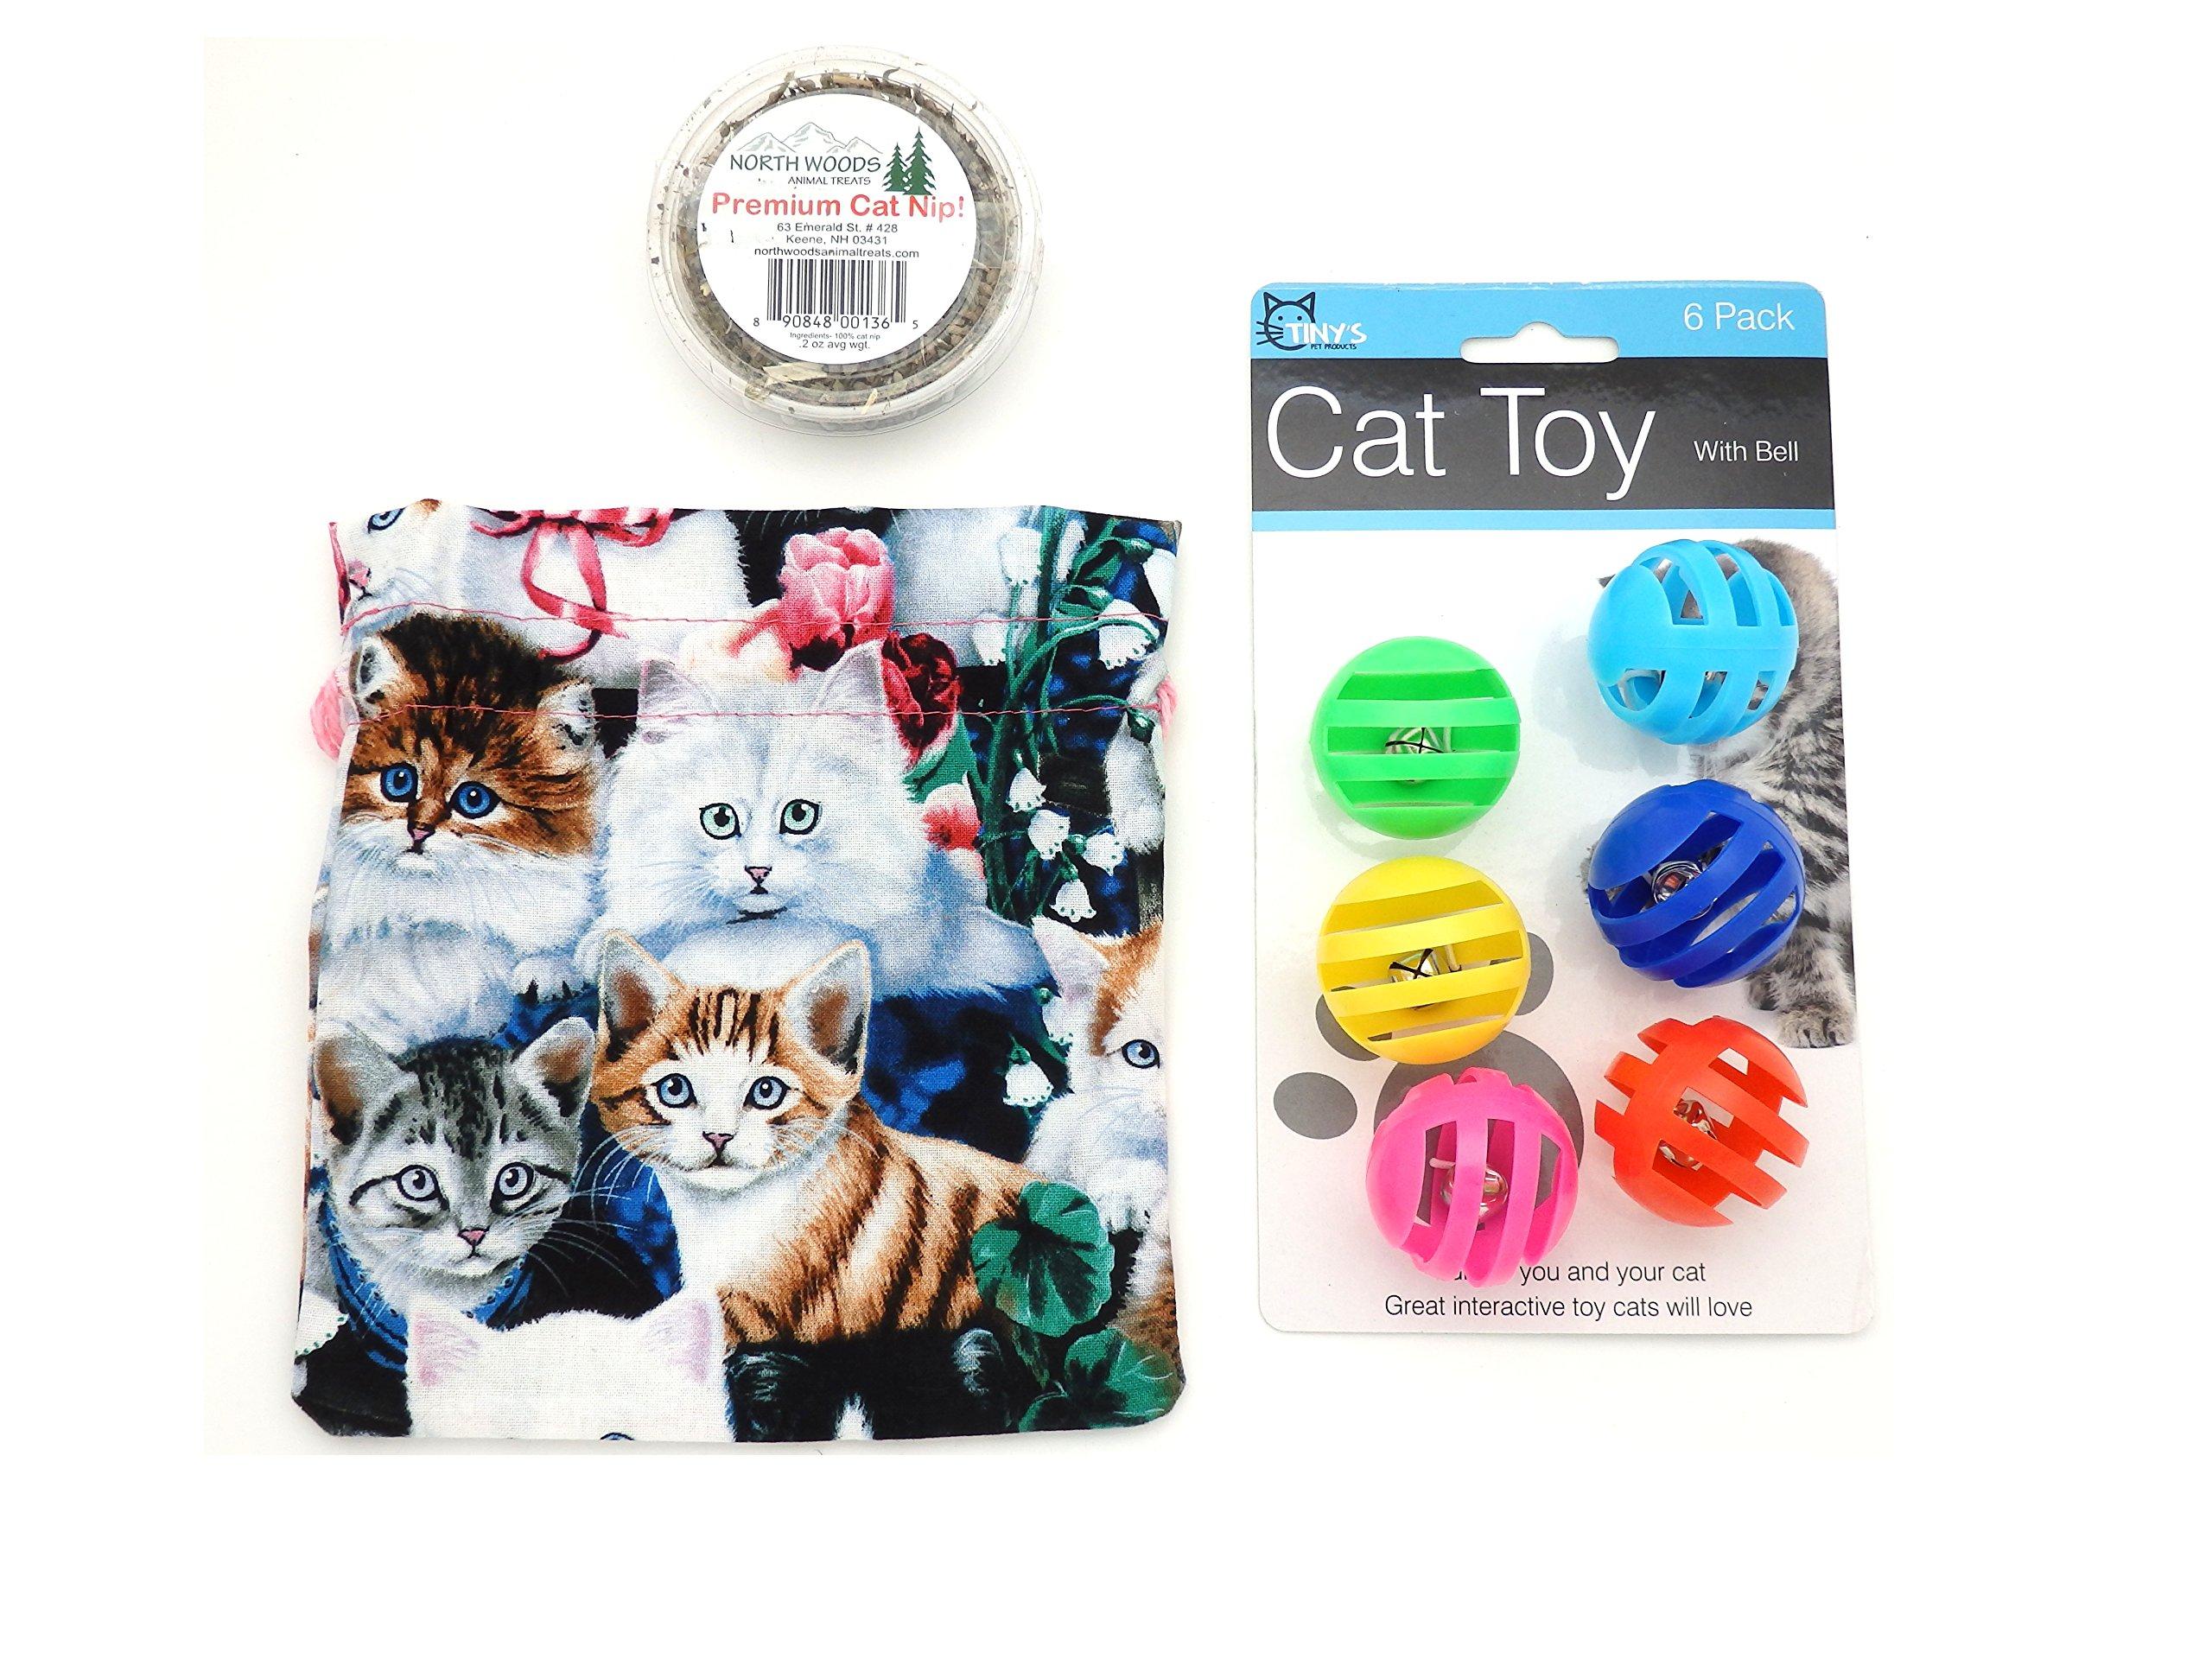 Catnip Cat Toy in Kitty Cat Kitten Fleece Drawstring Bag